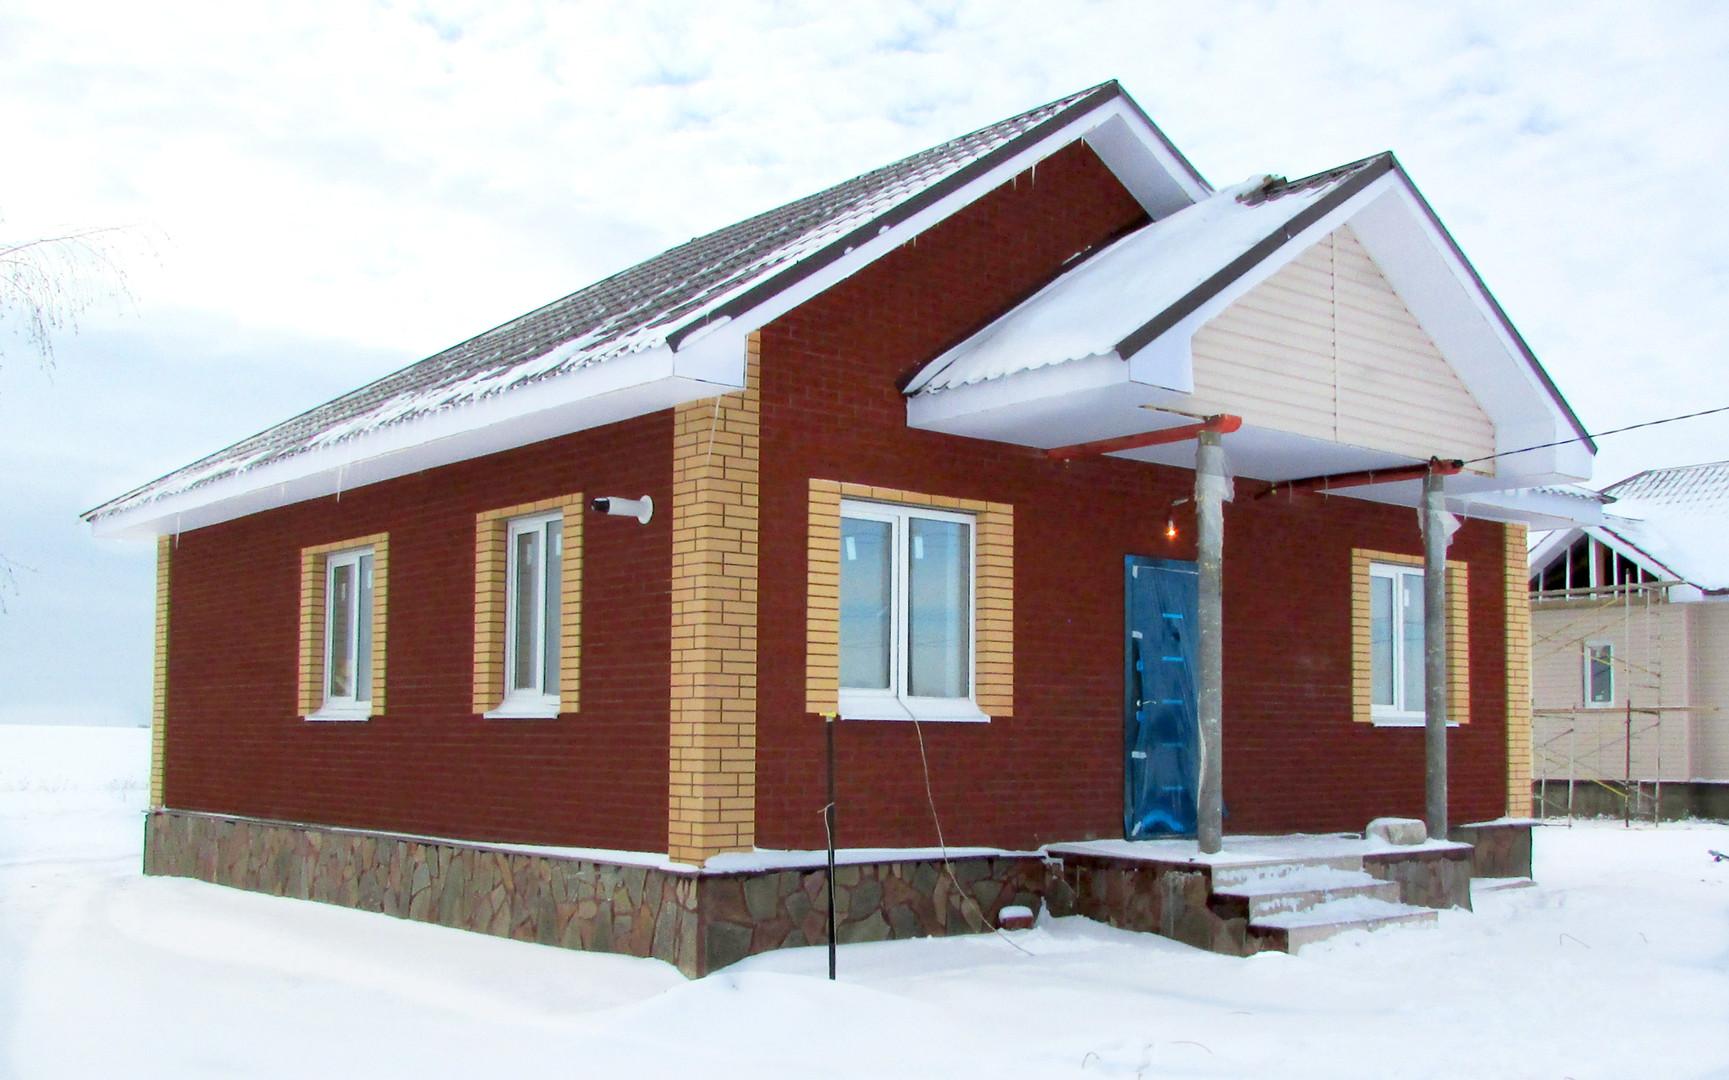 Дом из бархатного терракотового кирпича